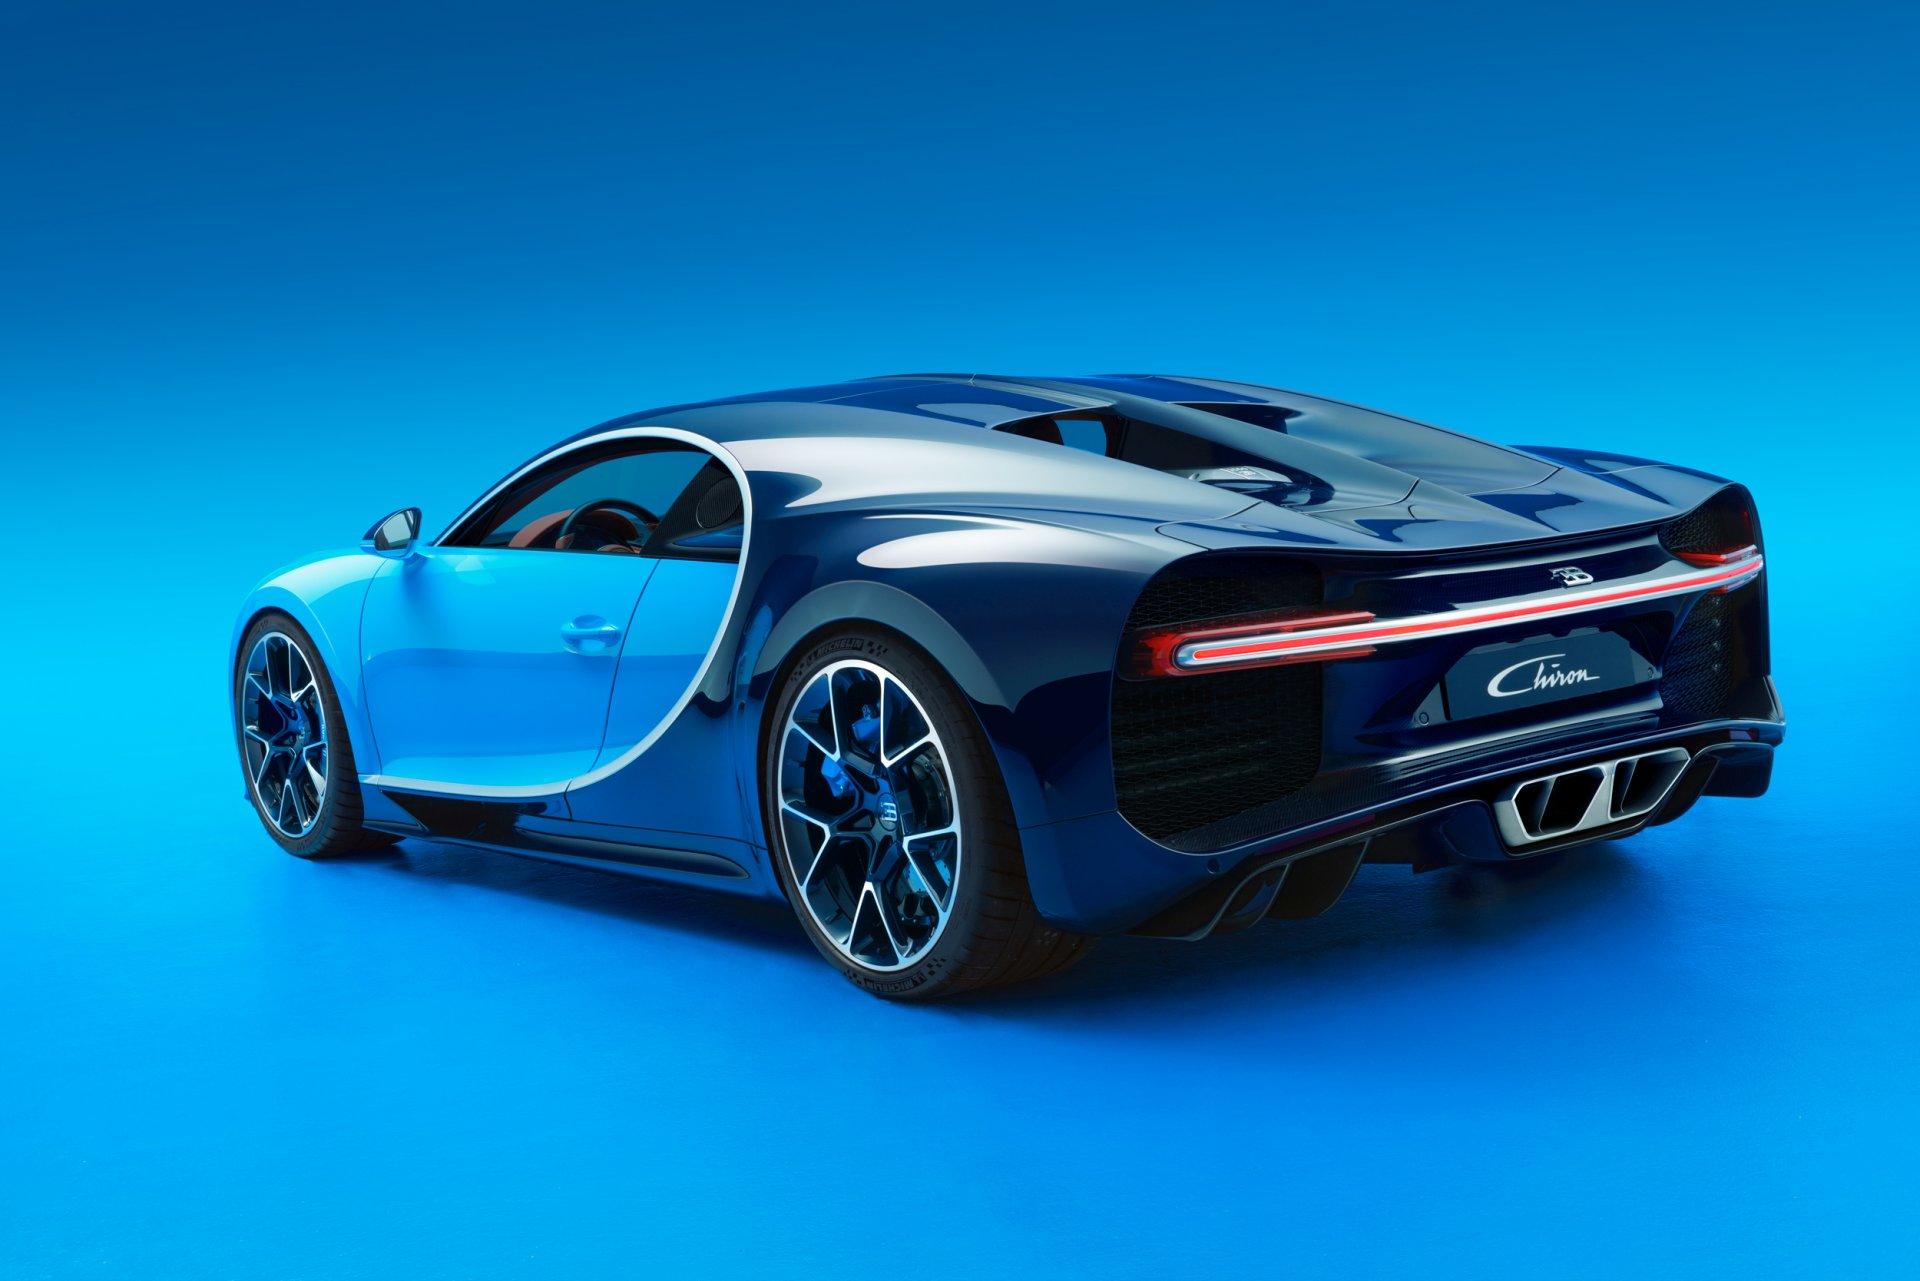 Bugatti Chiron 2016 - Hypercar.info on ariel atom rear, 1967 camaro rear, srt viper rear, 1970 camaro rear, veyron rear, 2014 camaro rear, mustang rear, volkswagen rear, 1968 camaro rear, hennessey venom gt rear, aston martin rear, ac cobra rear, koenigsegg rear, aventador rear,